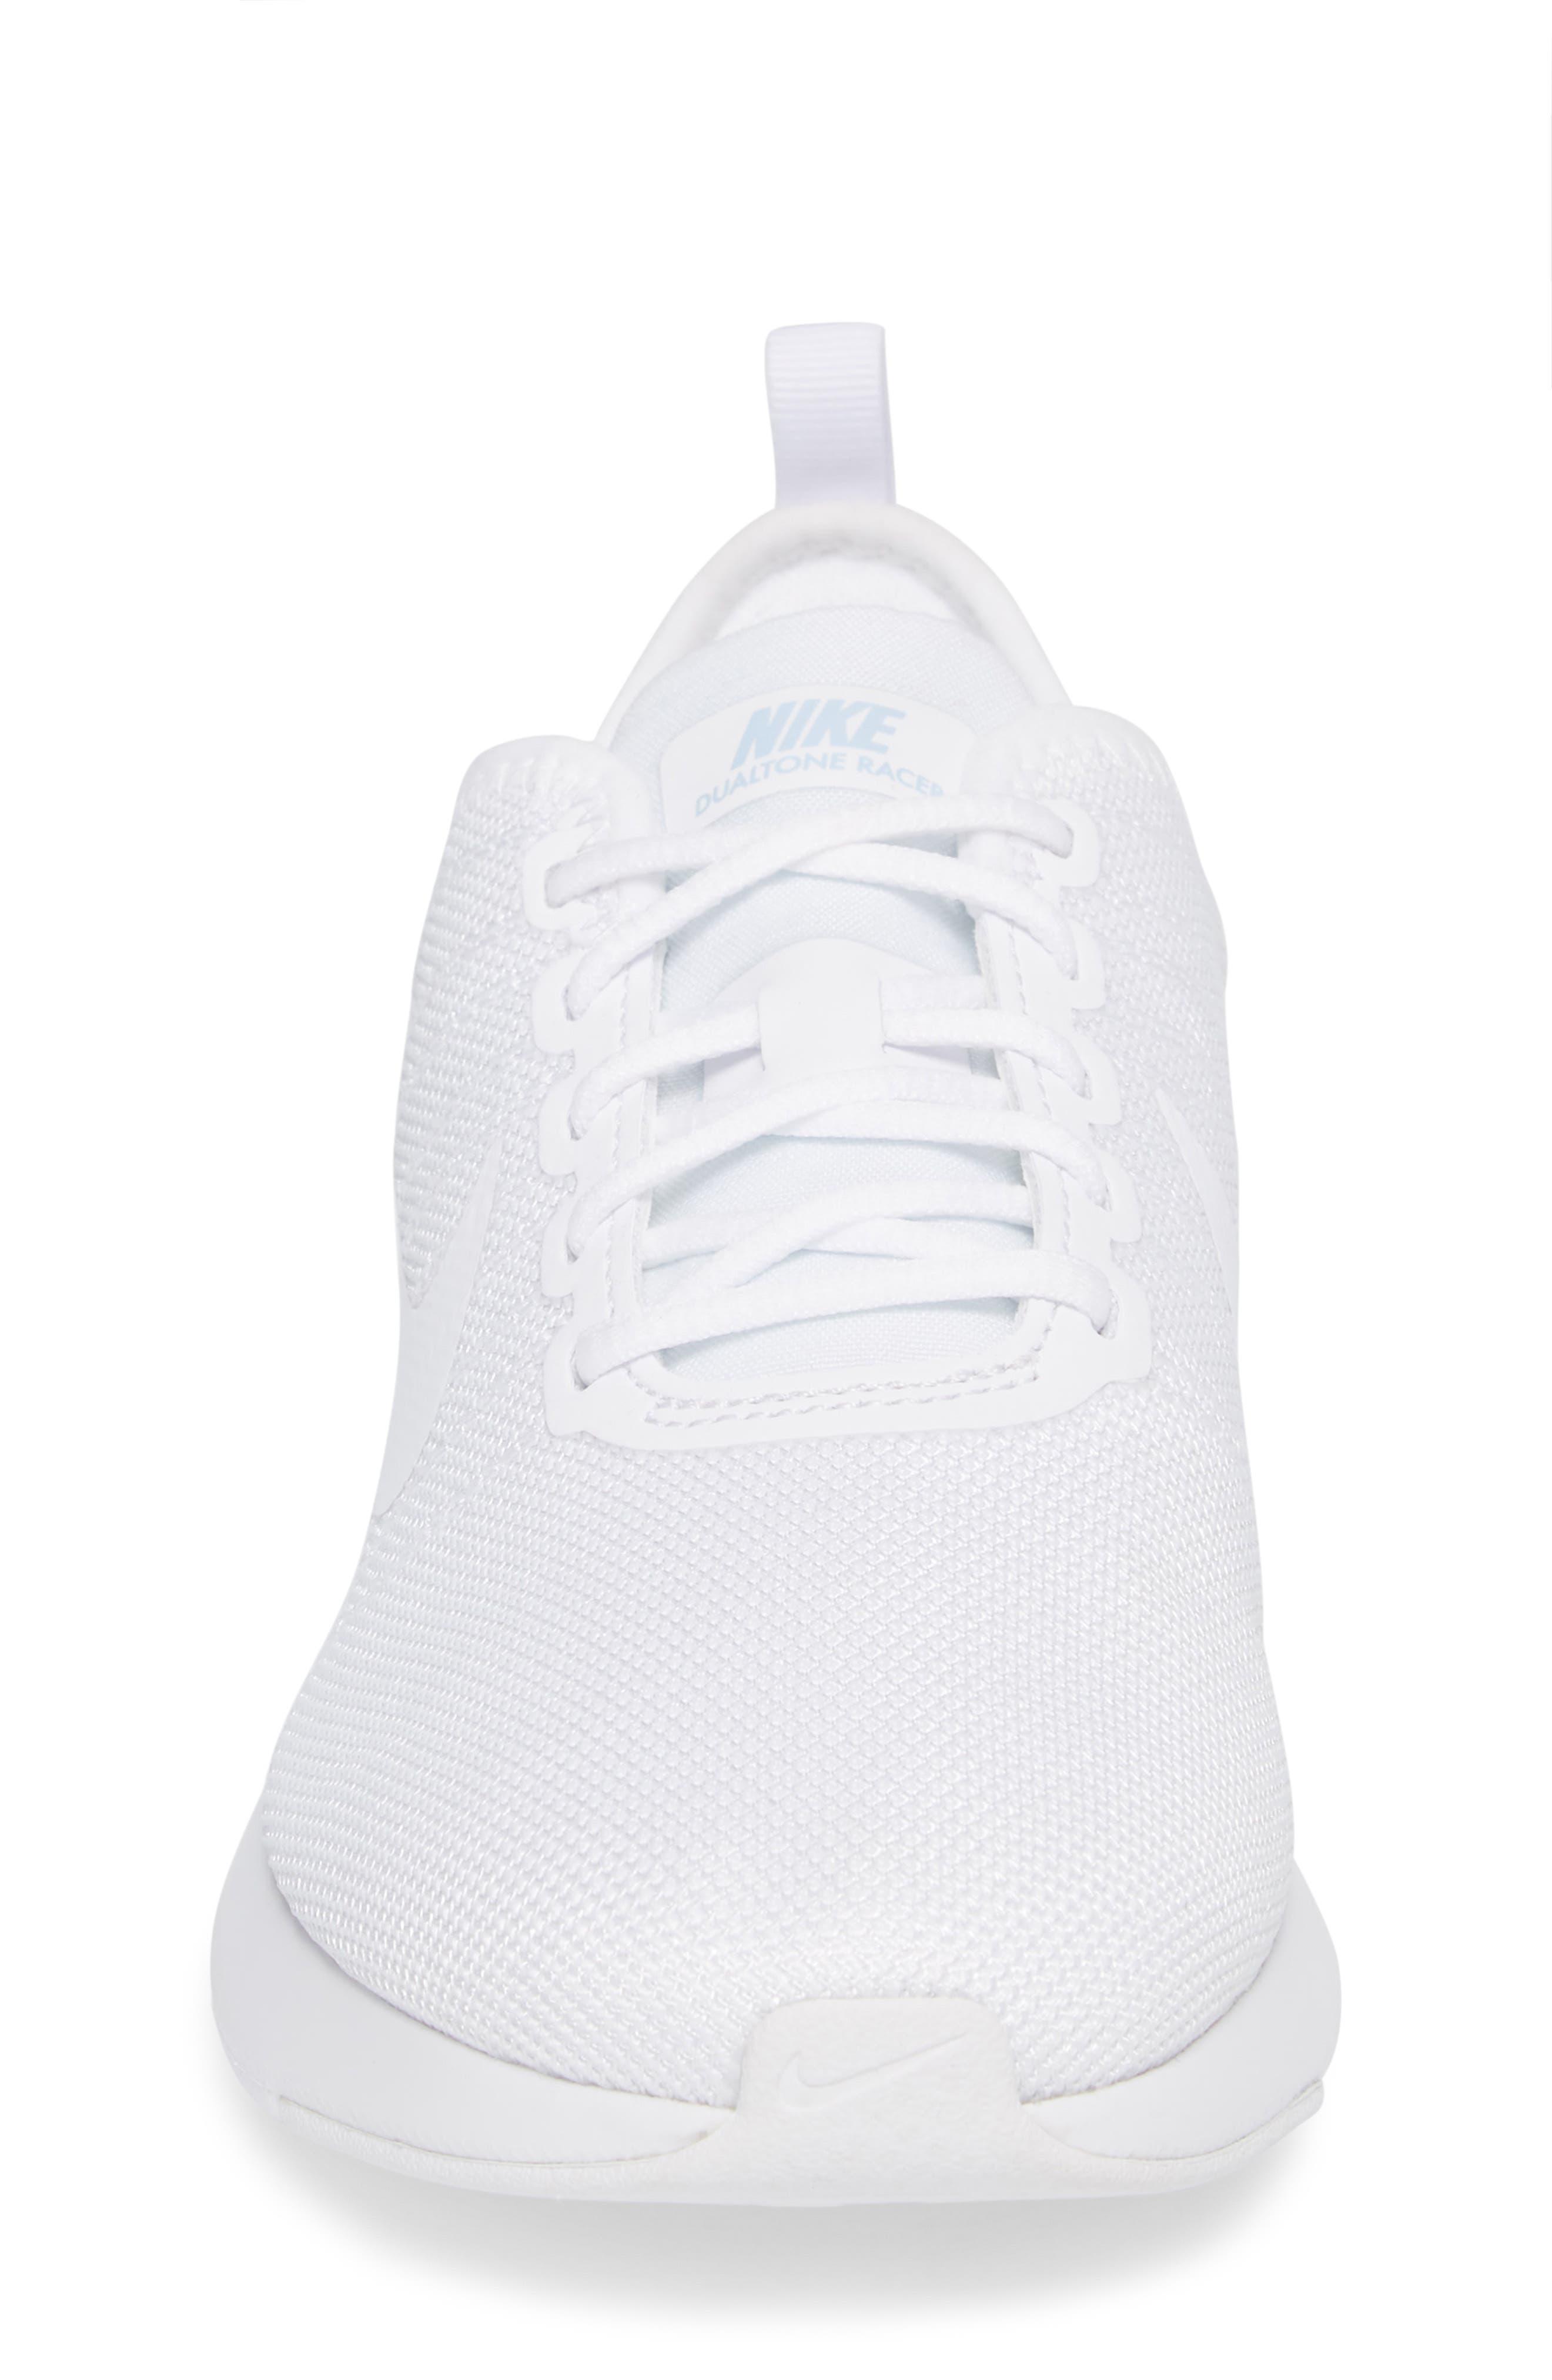 Dualtone Racer GS Sneaker,                             Alternate thumbnail 16, color,